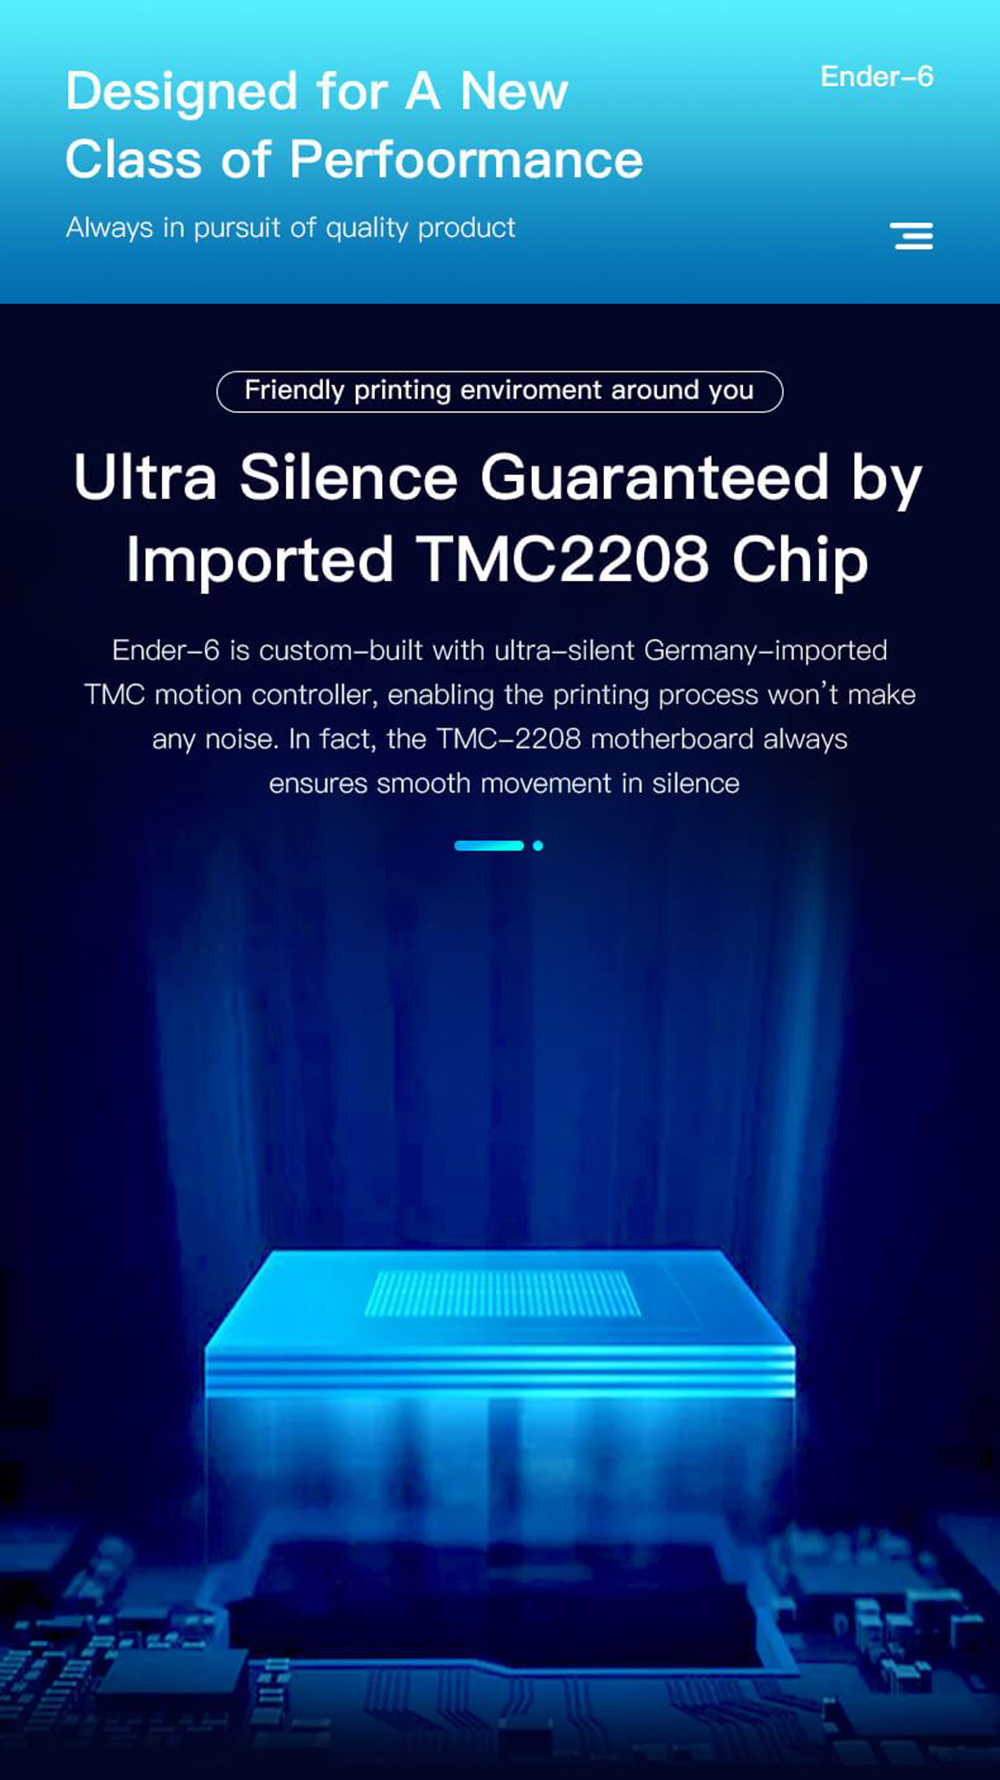 Creality3D Ender 6 3D-Drucker Bausatz - 250x250x400mm - Ultra leises TMC2208 Motherboard